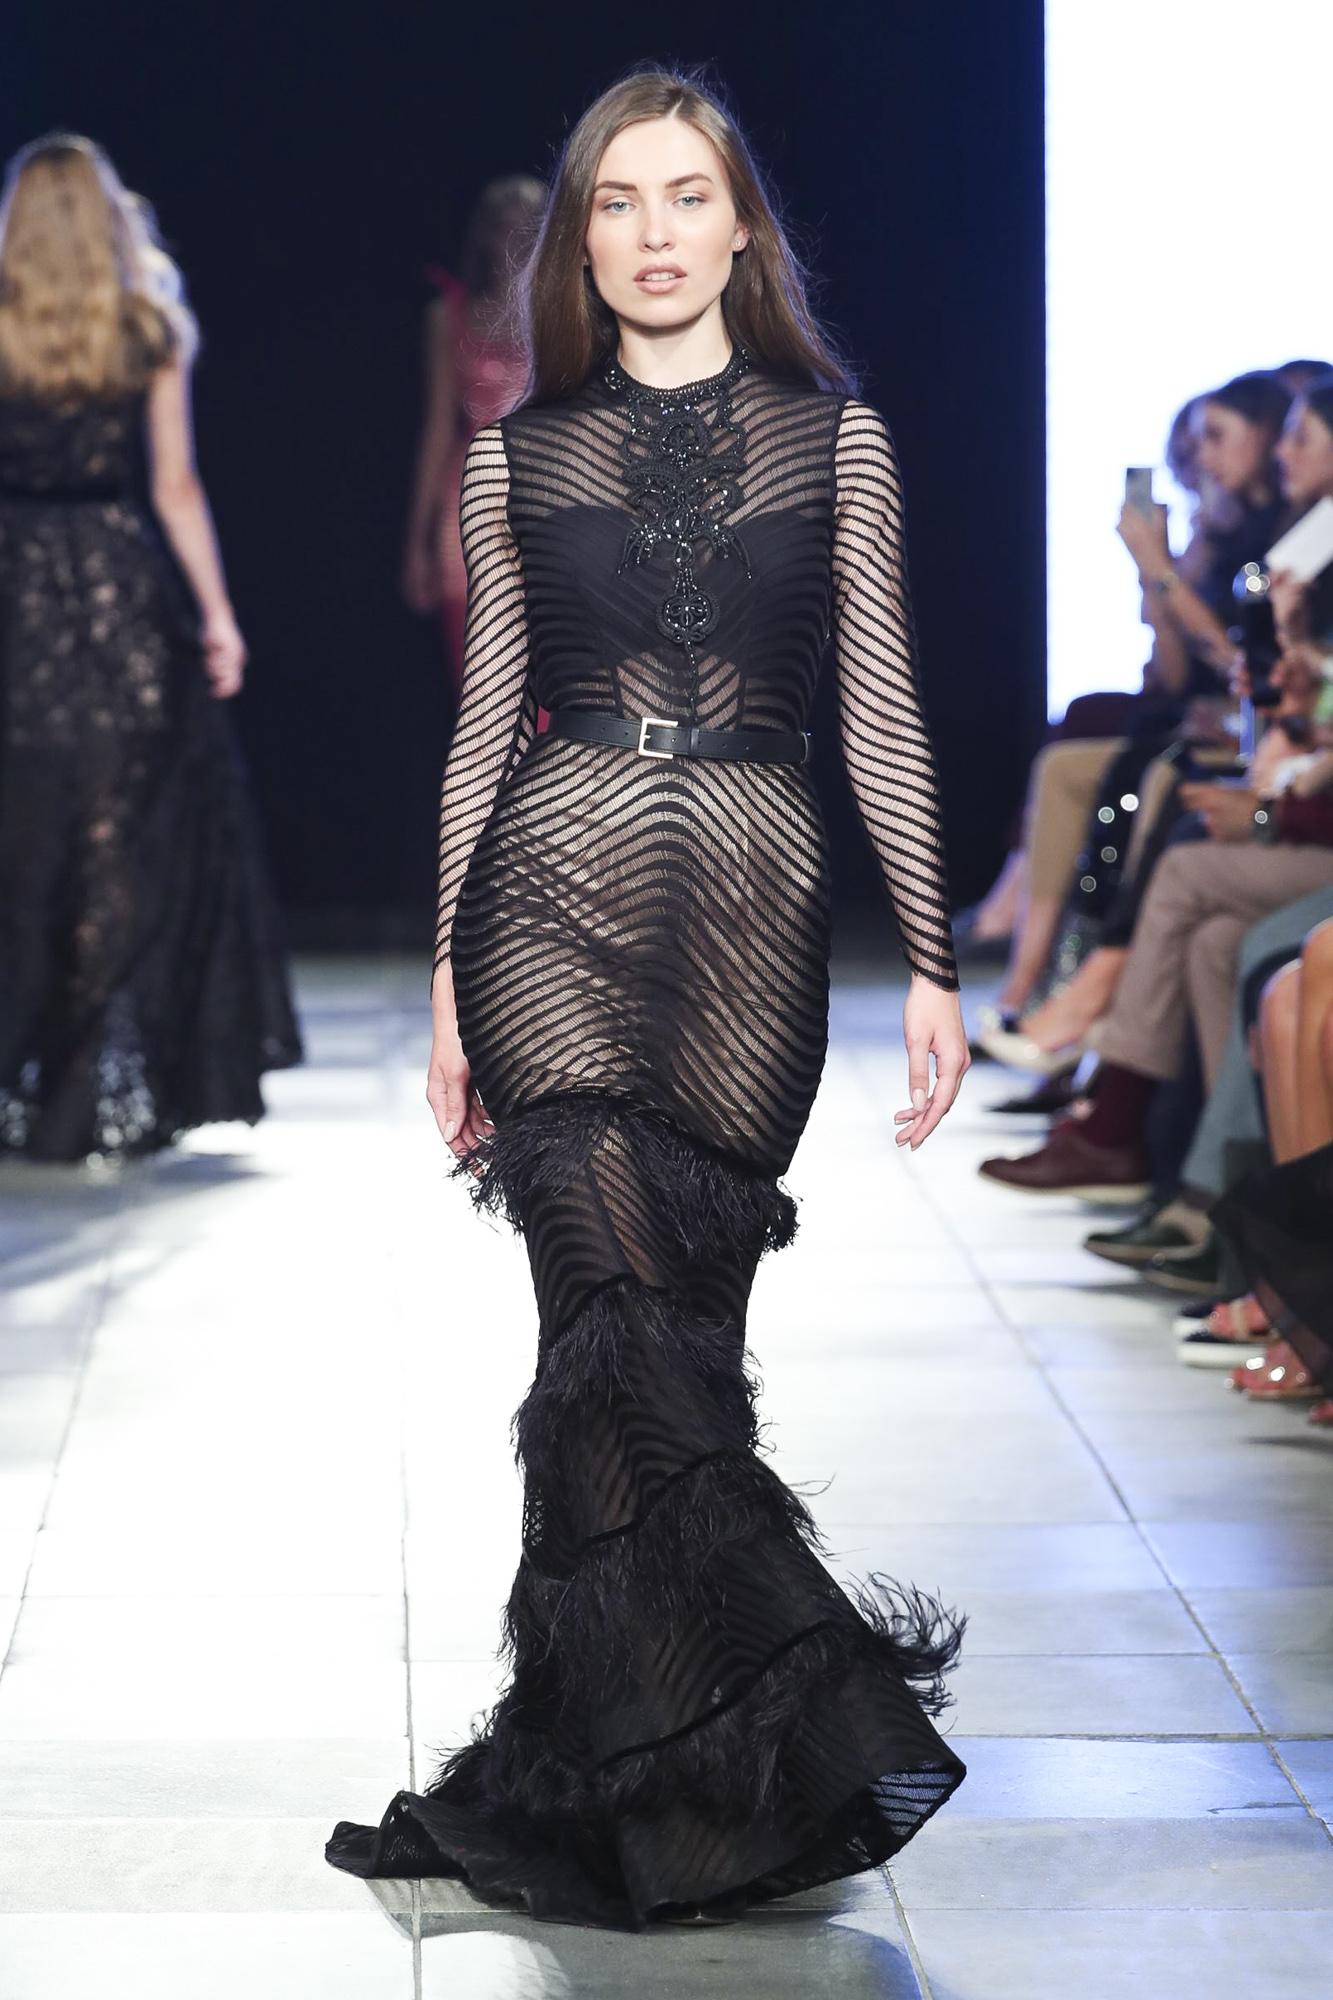 Malliny fashion show, Arab Fashion Week collection Spring Summer 2020 in Dubai